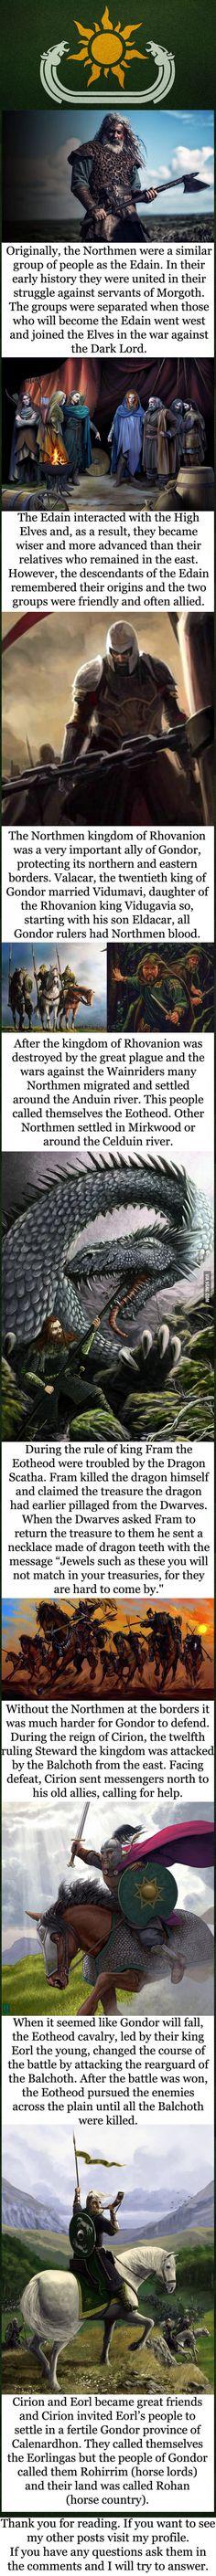 Tolkien lore - The Northmen